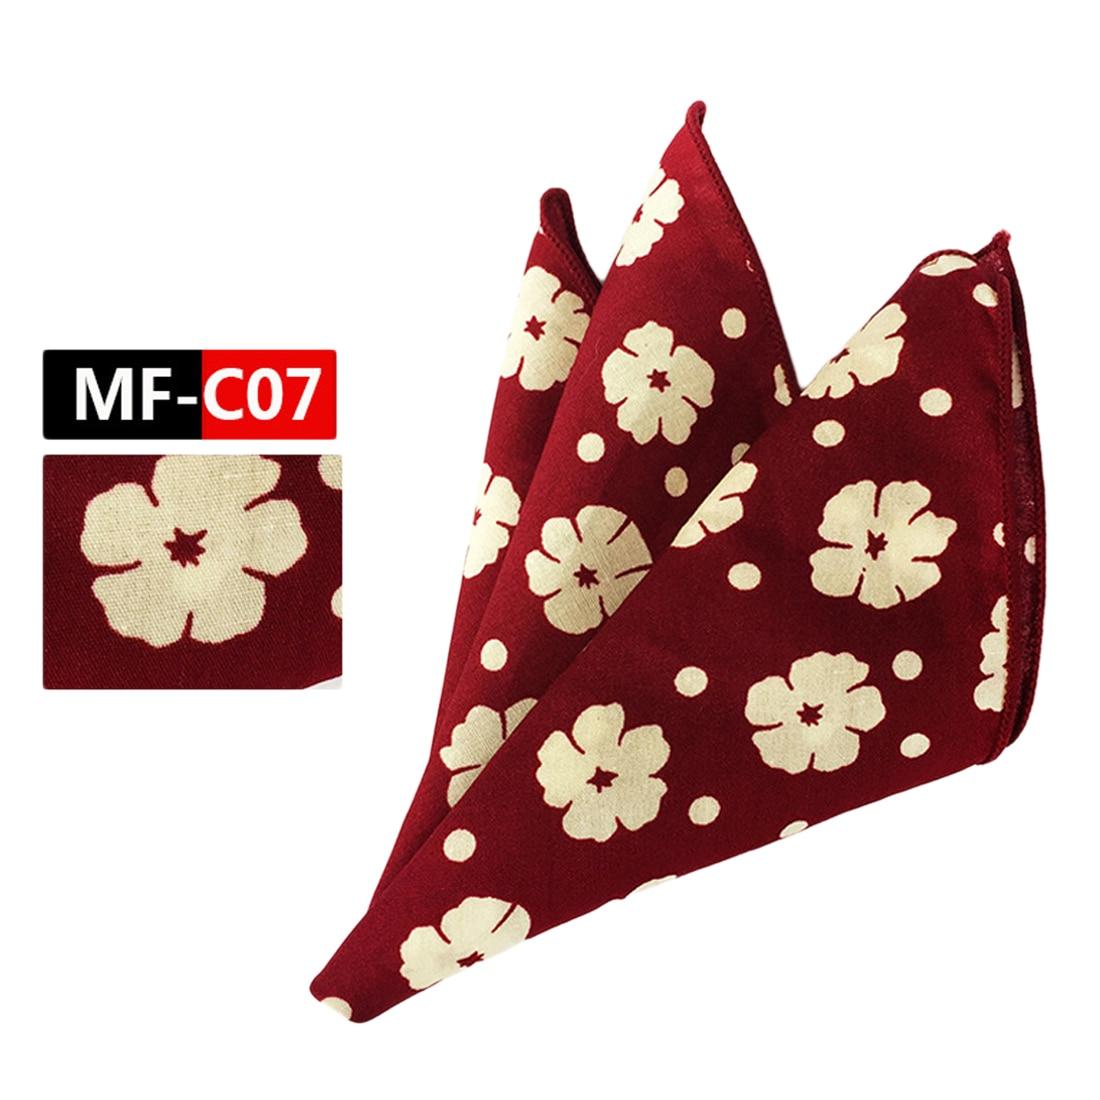 Hot Men's Cotton Pocket Square Western Style Floral Handkerchief For Suit Pocket Wedding Square Paisley 25x25cm